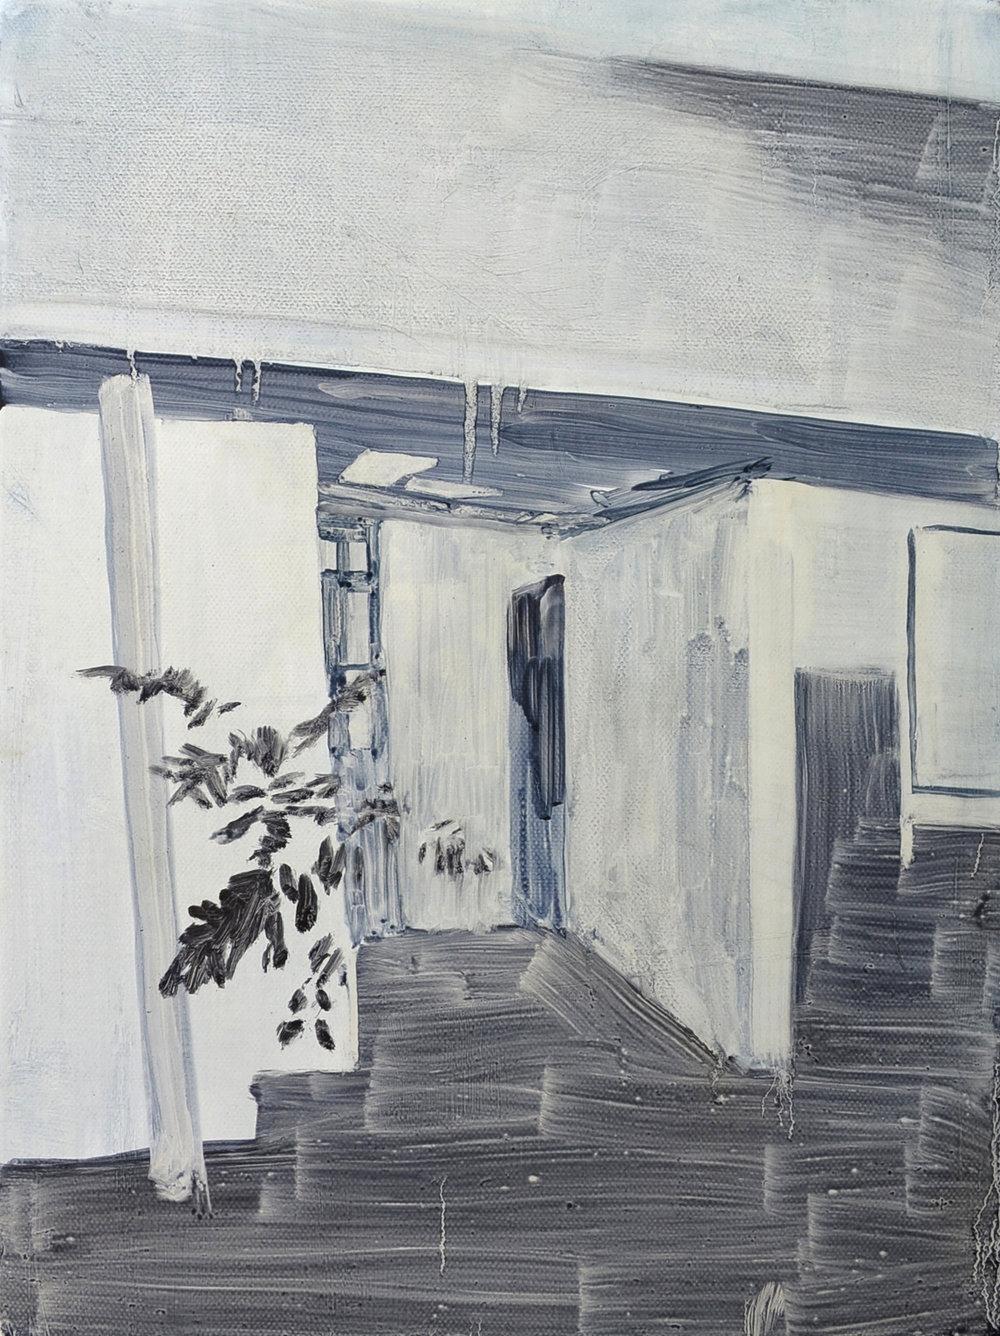 Daniel Nel  Plastic  Oil on canvas  40.5 x 30.5 cm